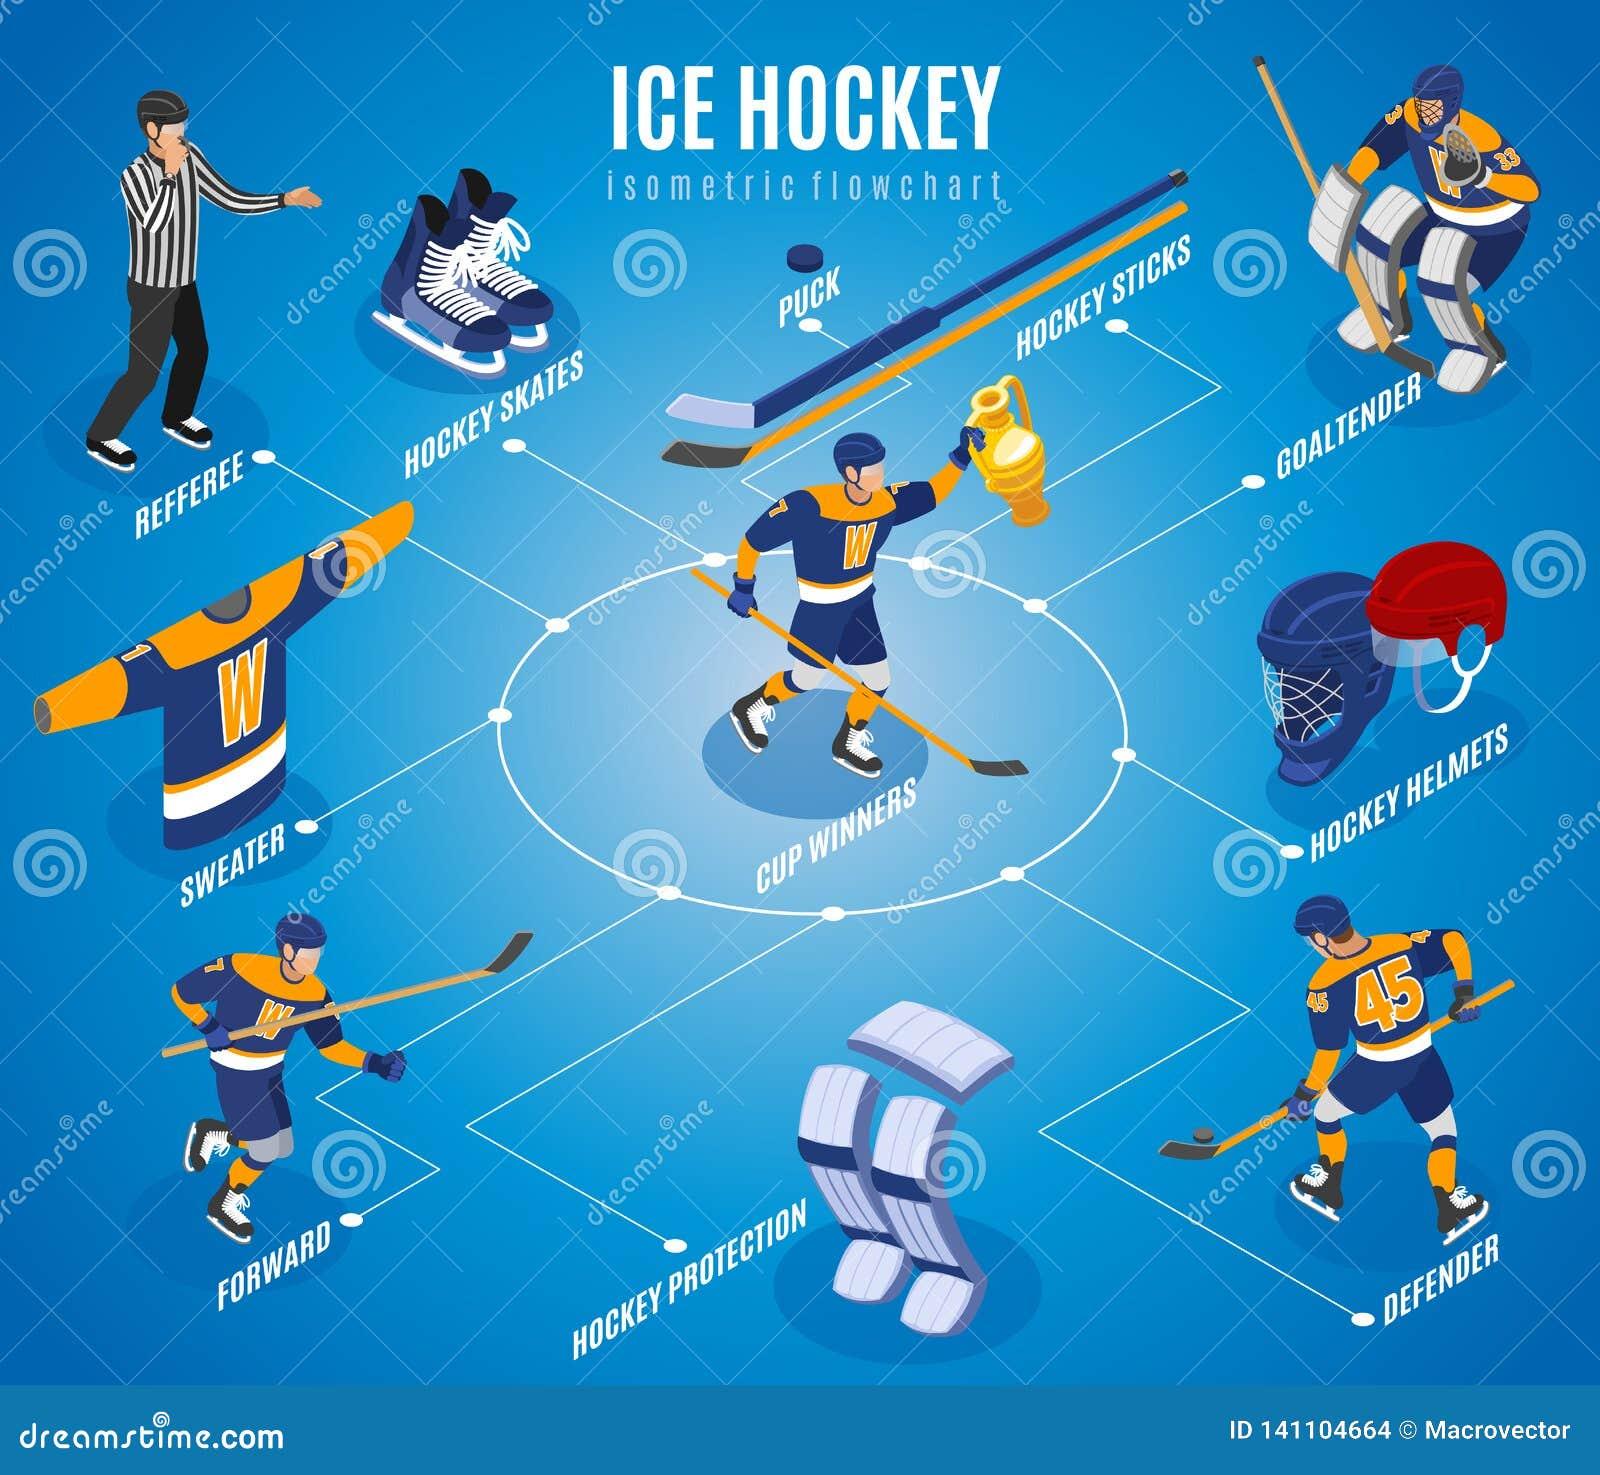 Ice Hockey Isometric Flowchart